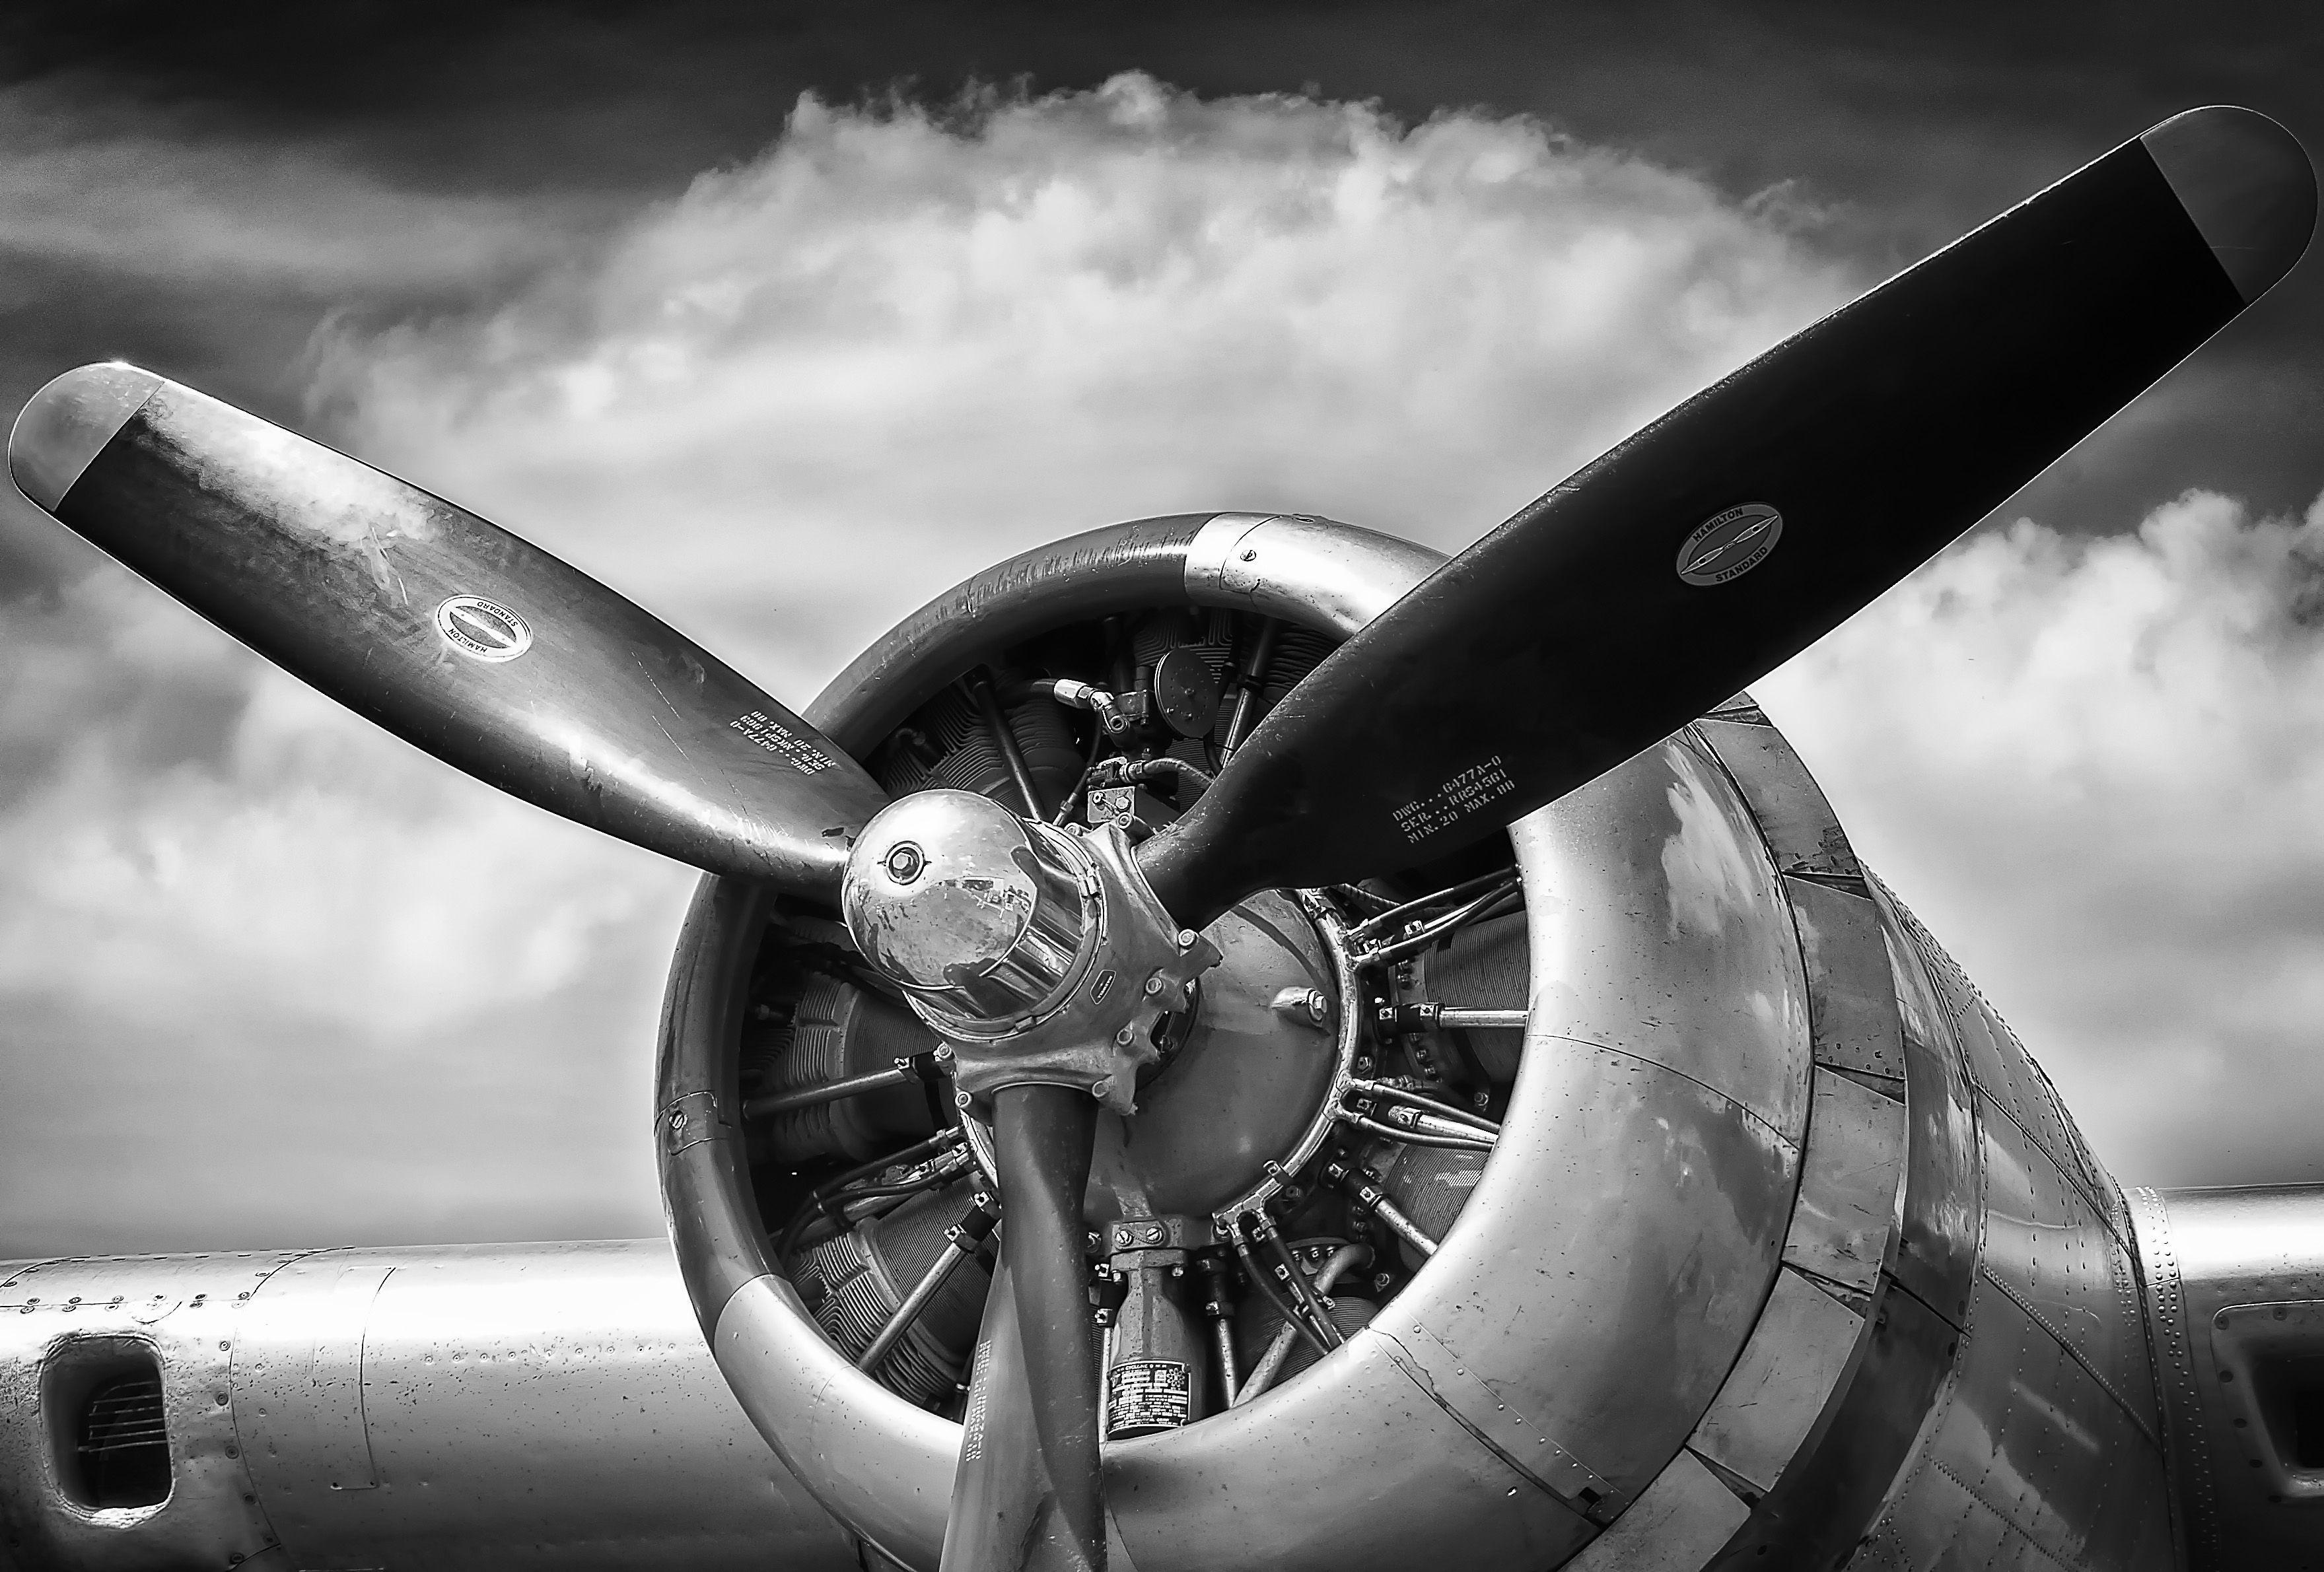 Ww2 fighter plane wallpapers top free ww2 fighter plane backgrounds wallpaperaccess - World war ii wallpaper ...